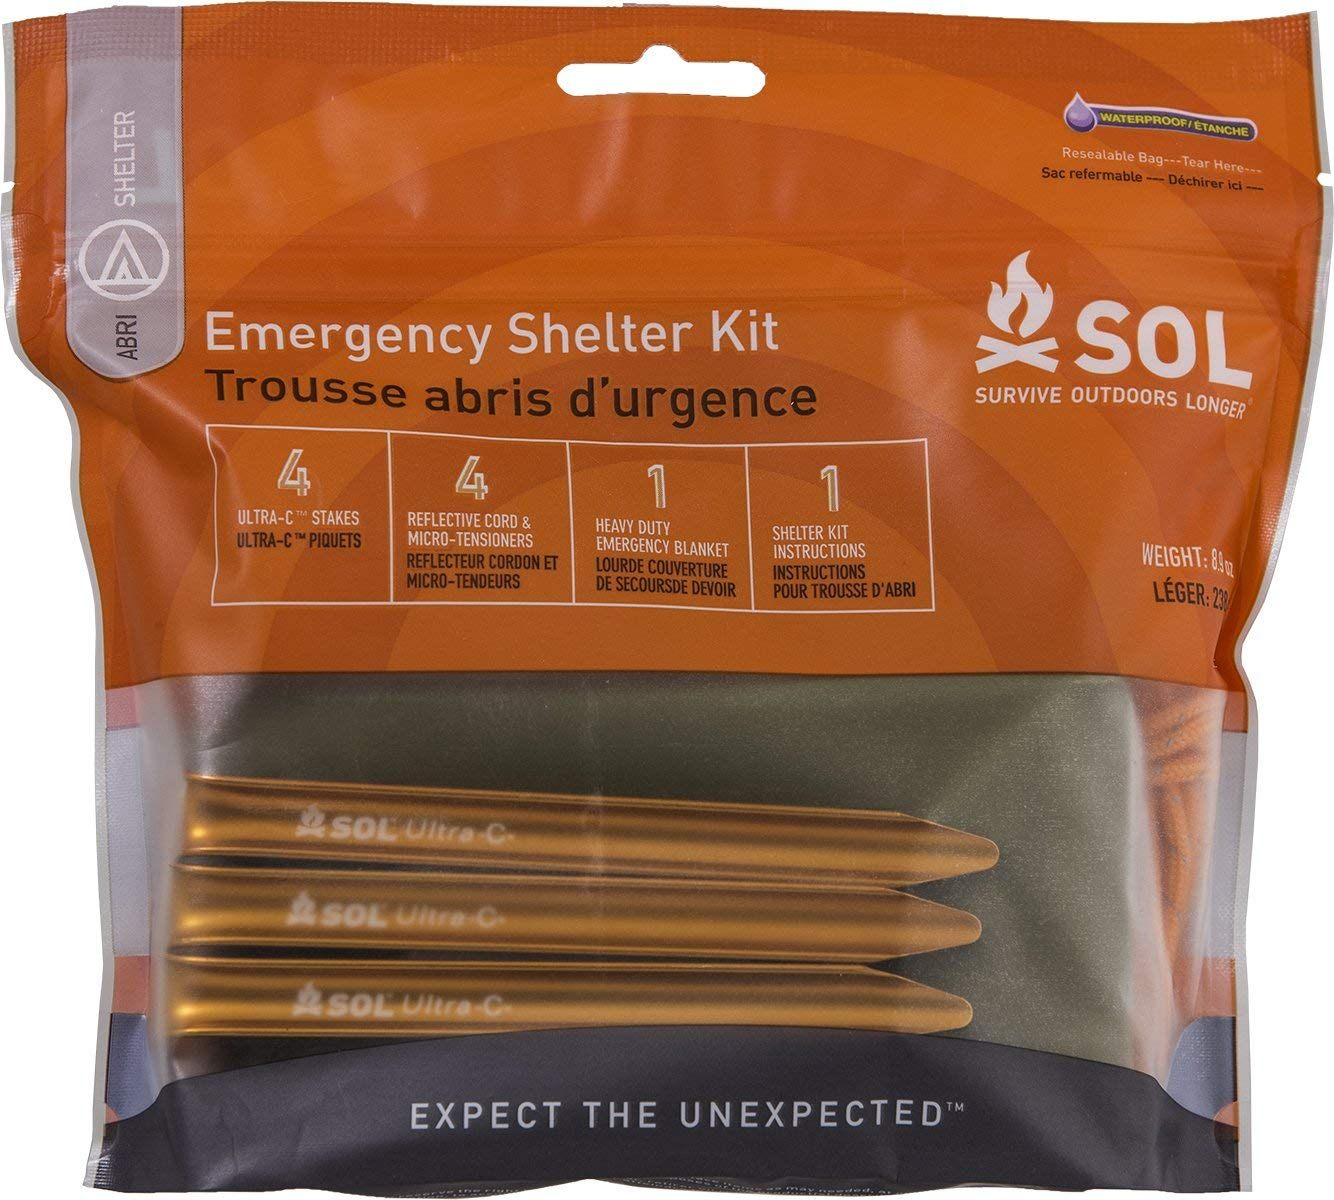 Lit sol Bebe Charmant Amazon S O L Survive Outdoors Longer Emergency Shelter Kit